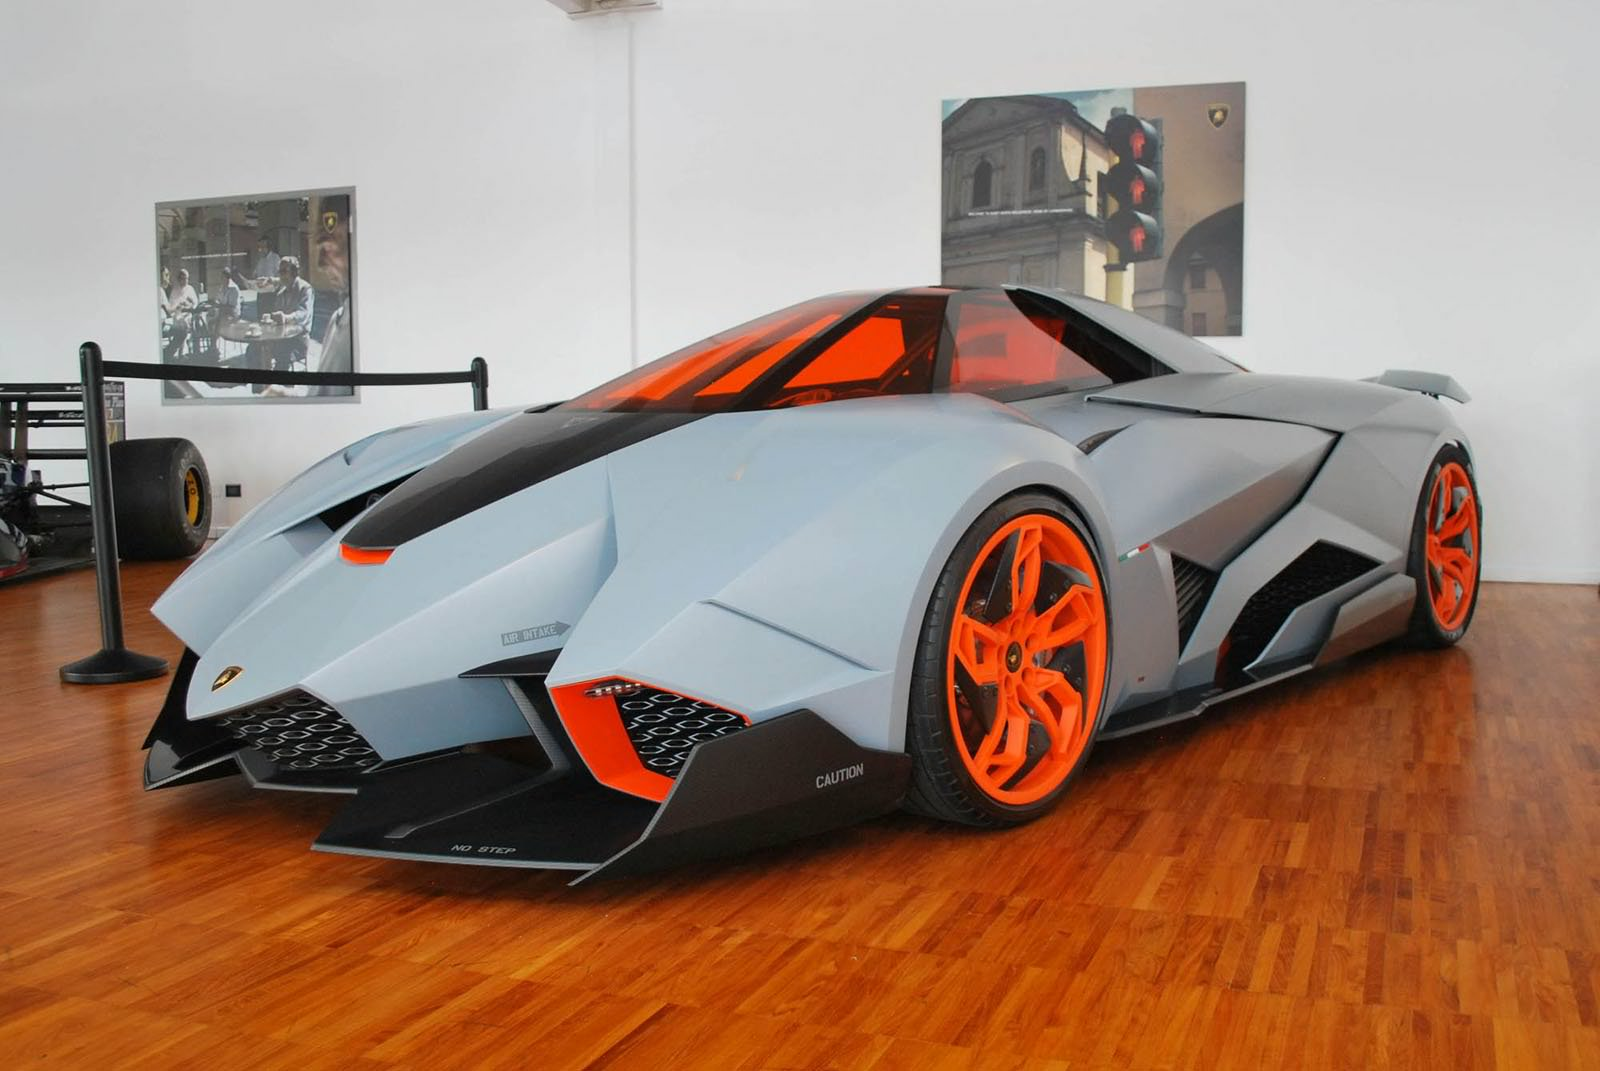 2016 Geneva Motorshow Egoista Is Italian For Selfish A Close Encounter With Rare Lamborghini